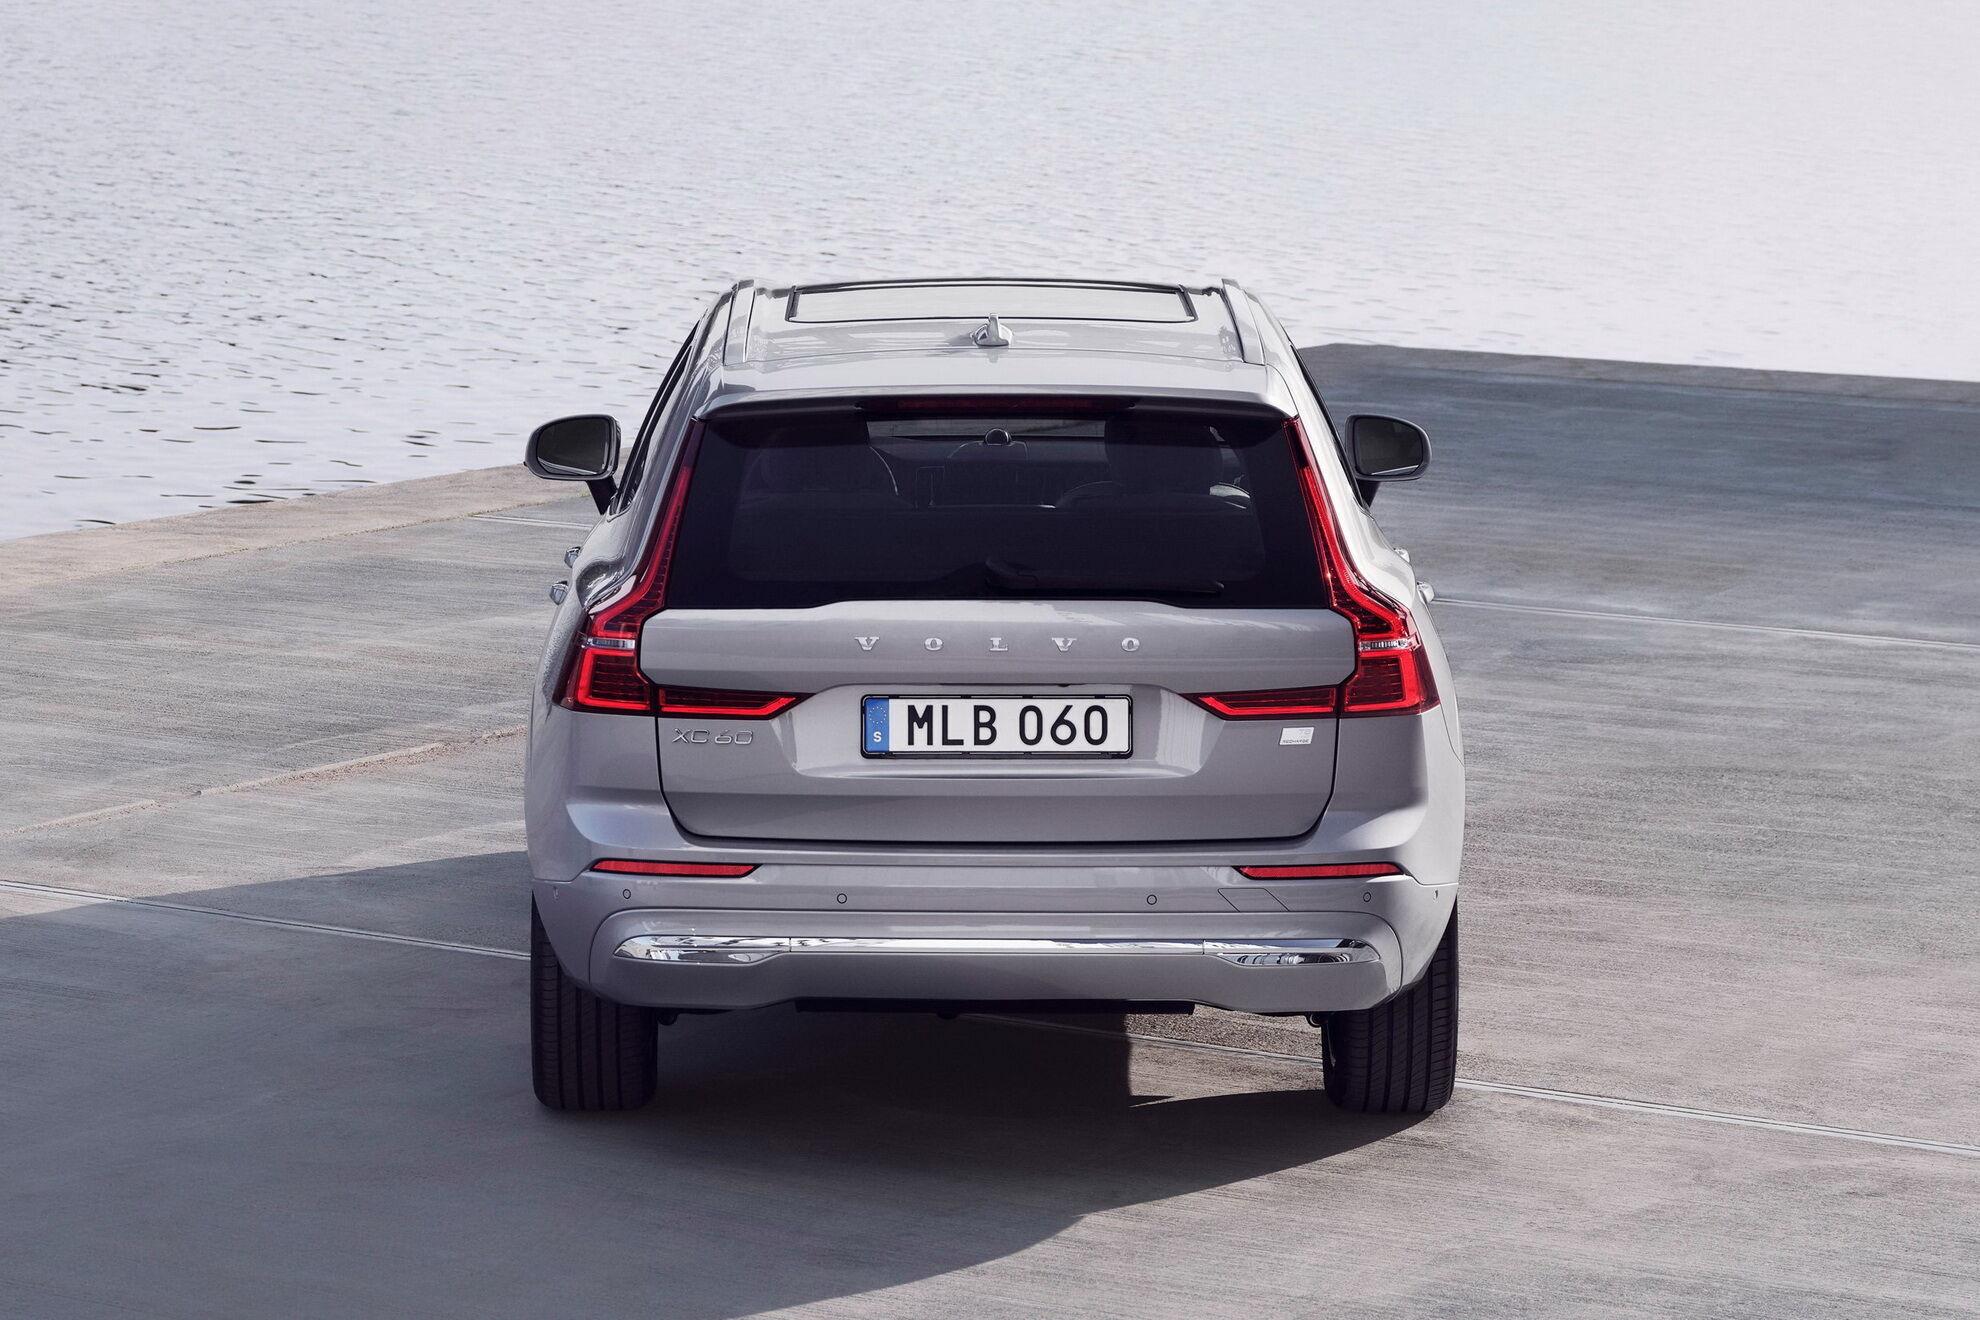 Оновлений XC60 отримав комплексну систему безпеки Advanced Driver Assistance Systems